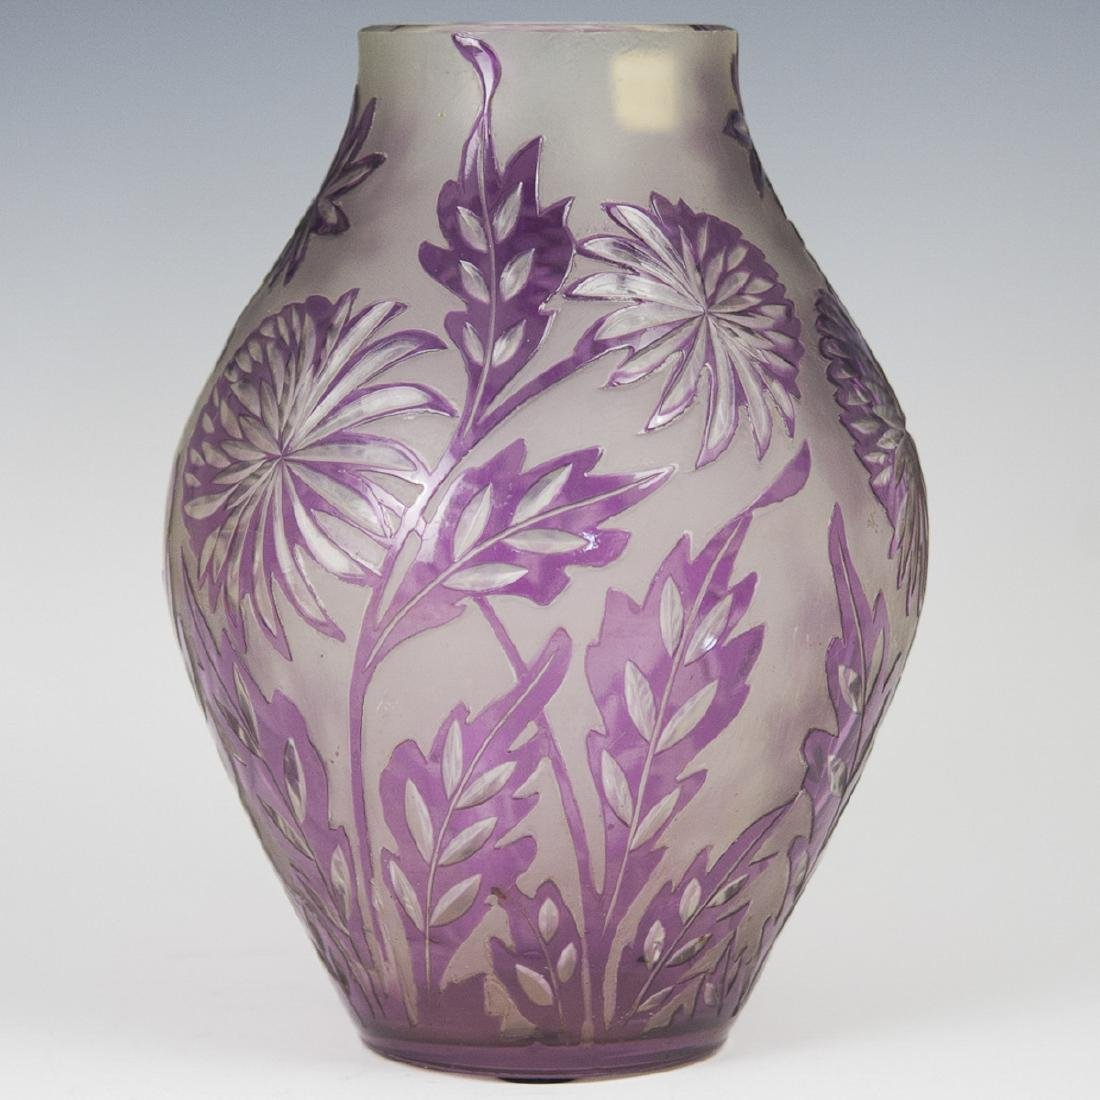 Antique Cut Crystal Vase